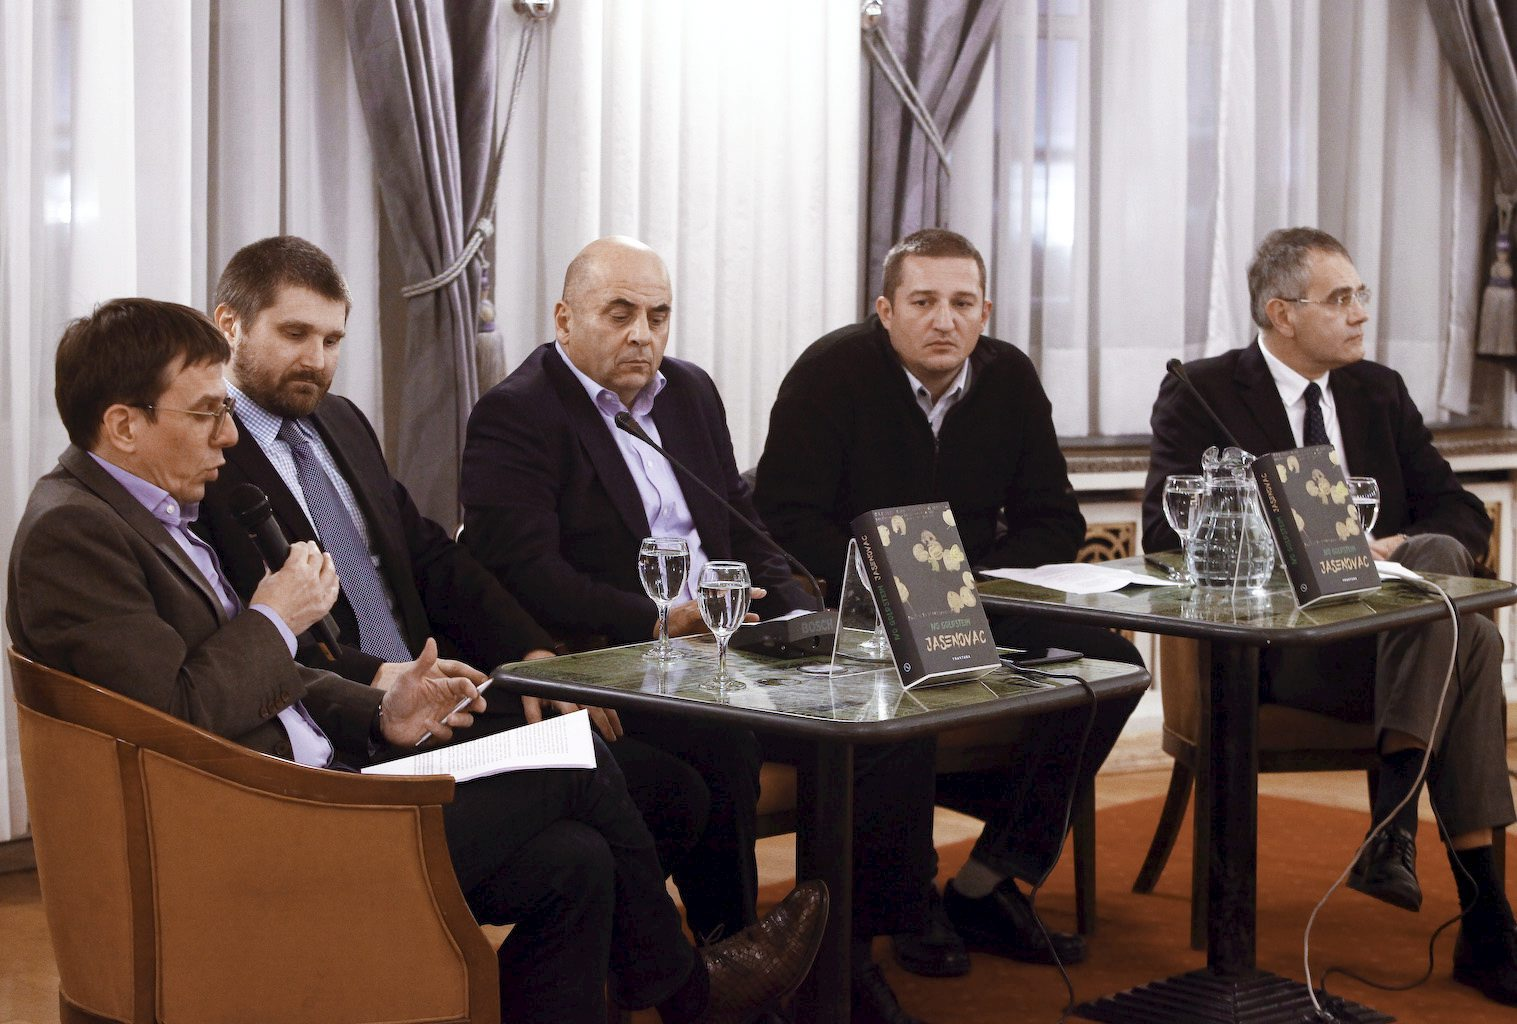 Na fotografiji: Seid Serdarević, Goran Hutinec, Ivo Goldstein, Đorđe Mihovilović, Vuk Perišić